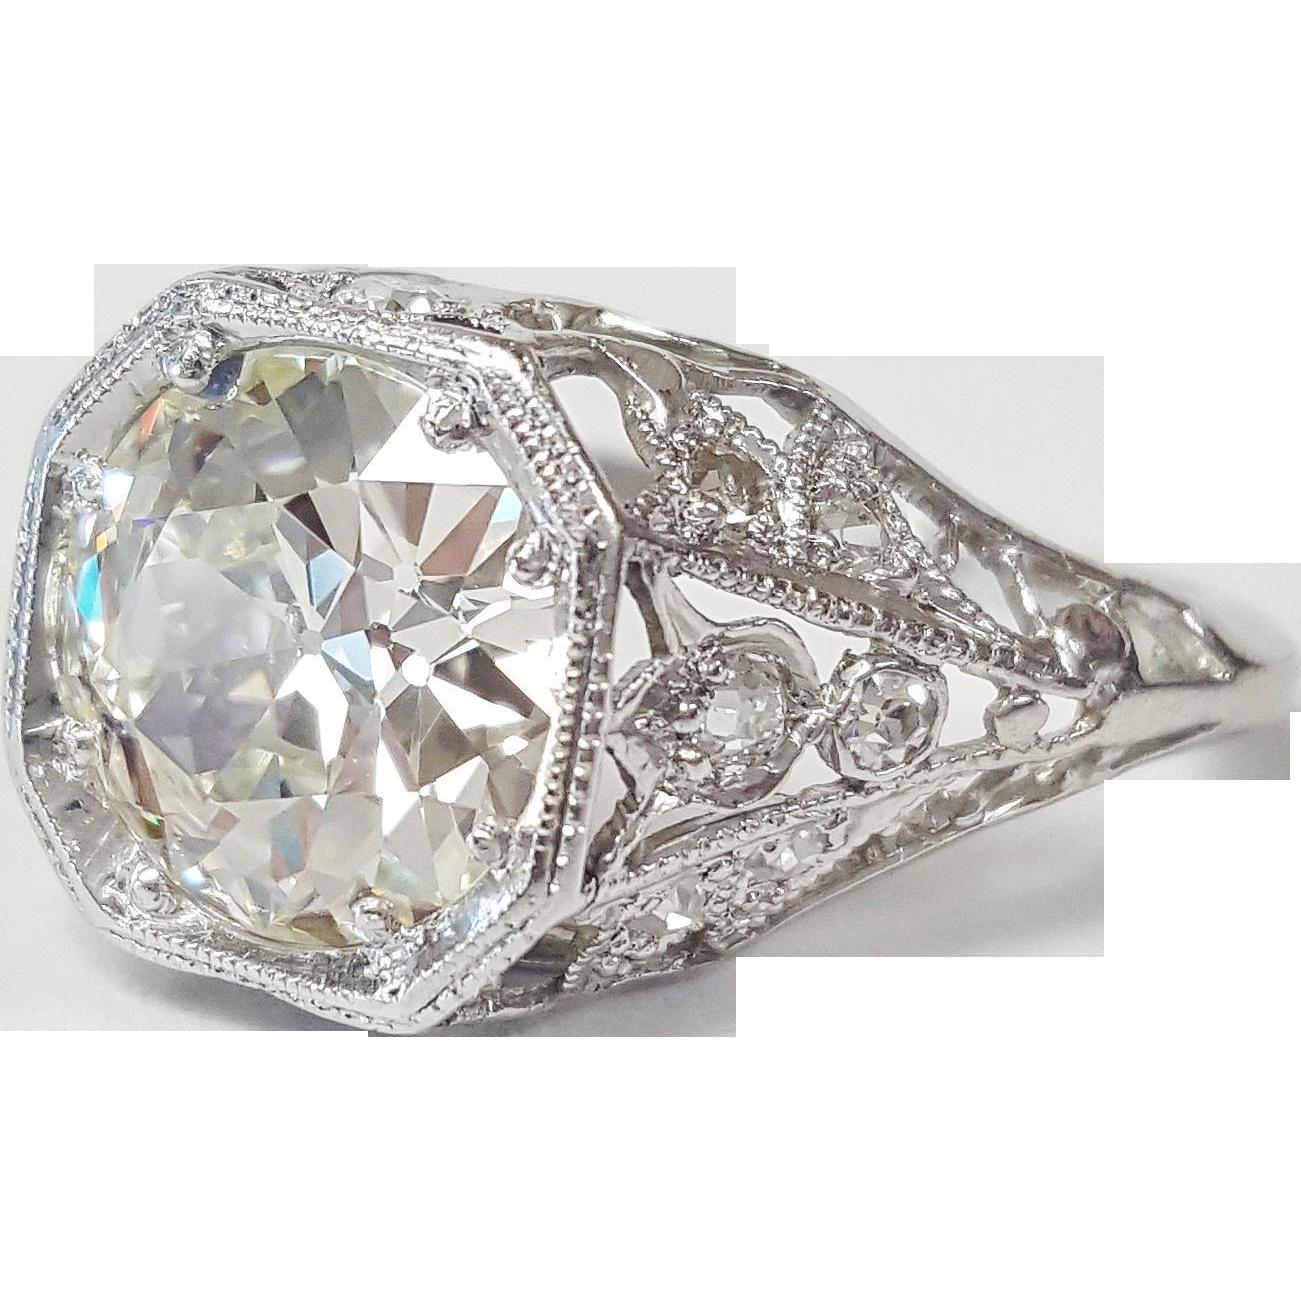 Furniture Repair Rochester Ny Edwardian Platinum Diamond Ring from krikorian-jewelers on Ruby Lane